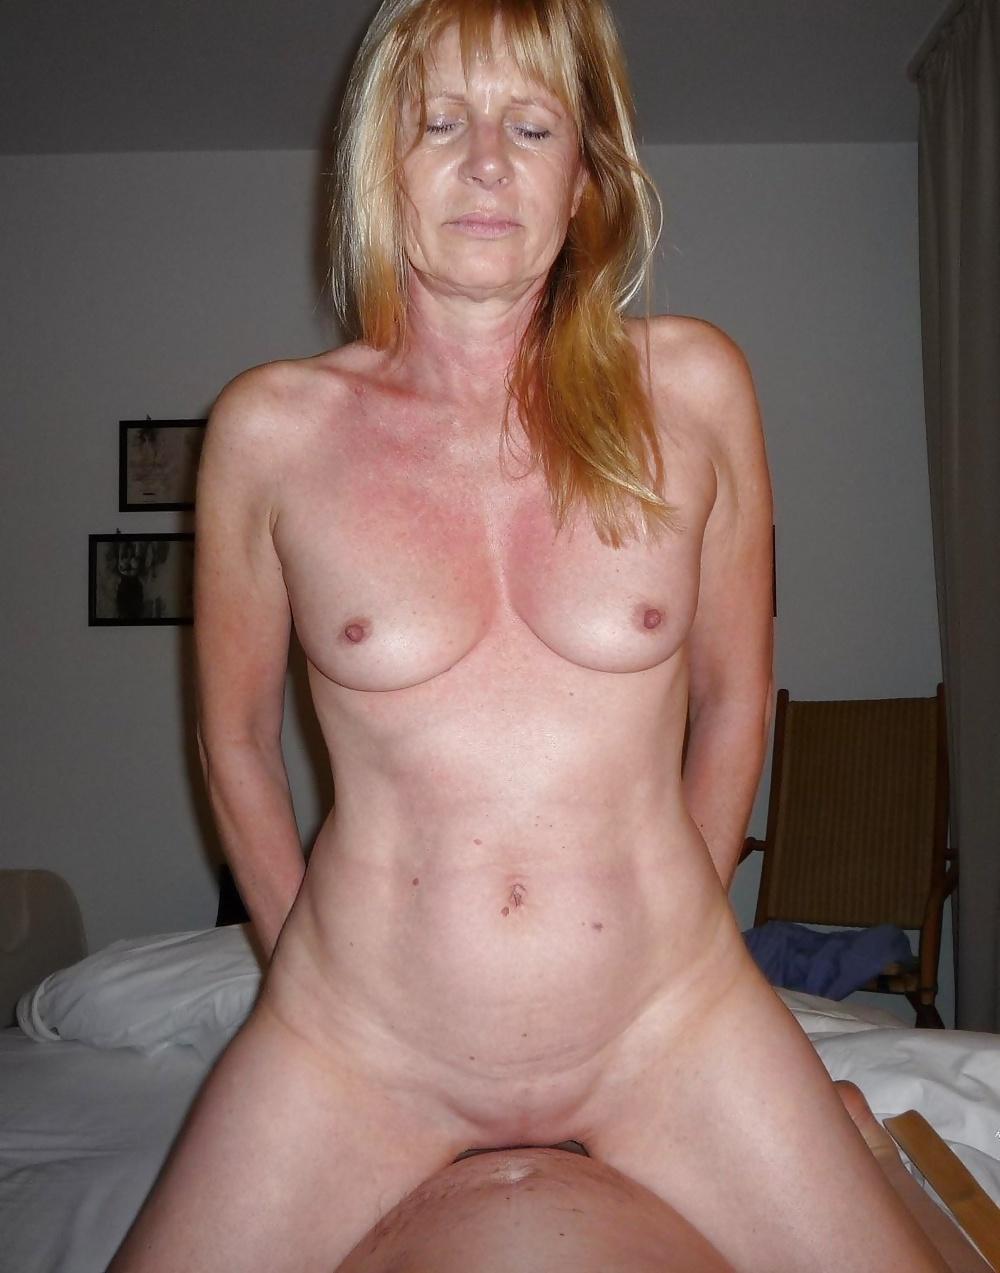 amateur-wives-pics-uk-sensal